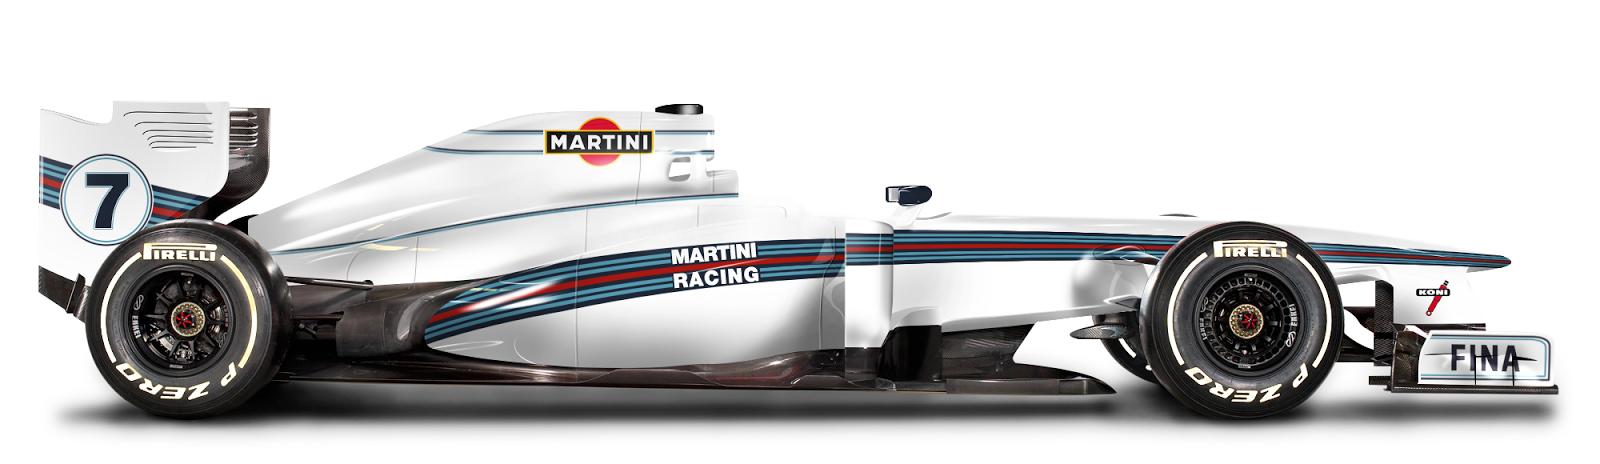 Brabham+martini+blanche.png